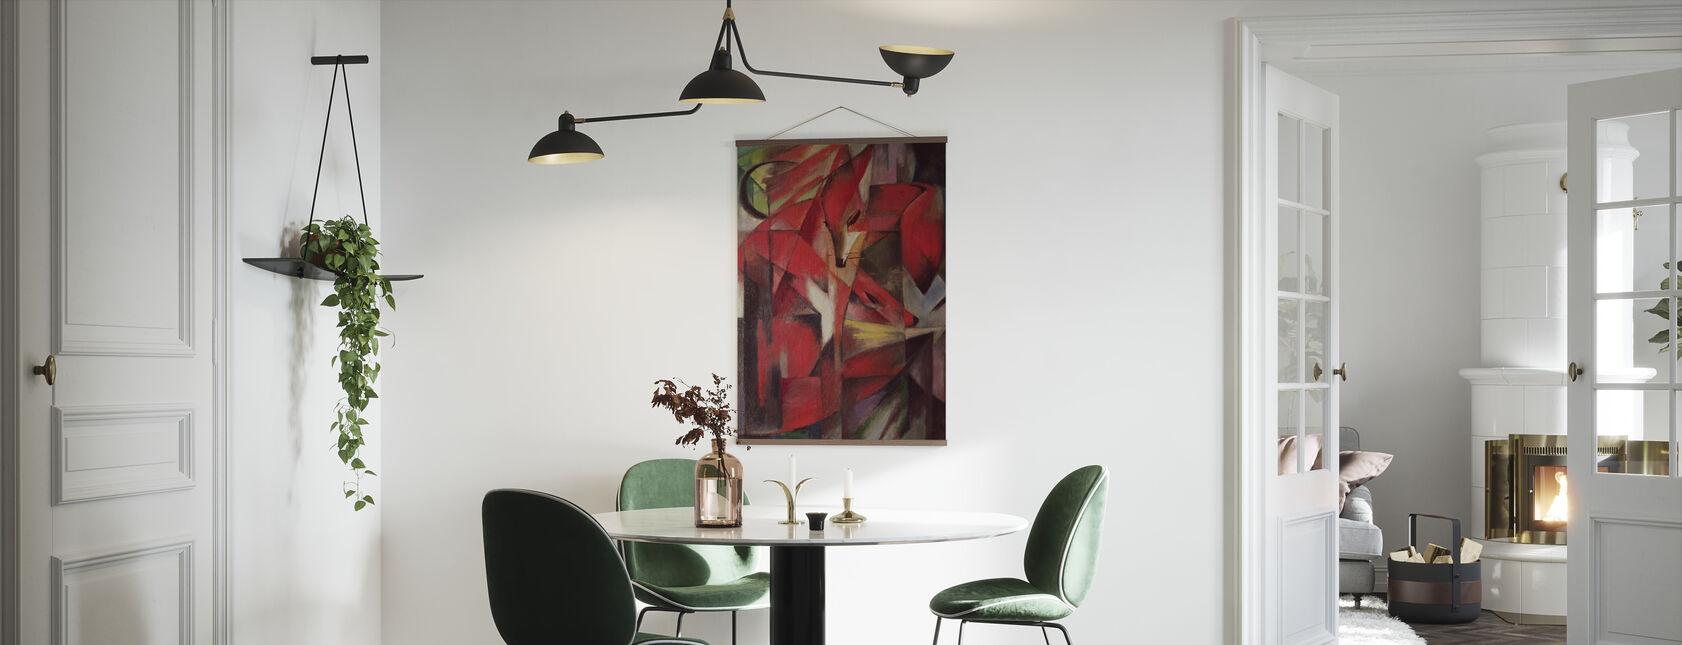 Foxes - Franz Marc - Poster - Kitchen